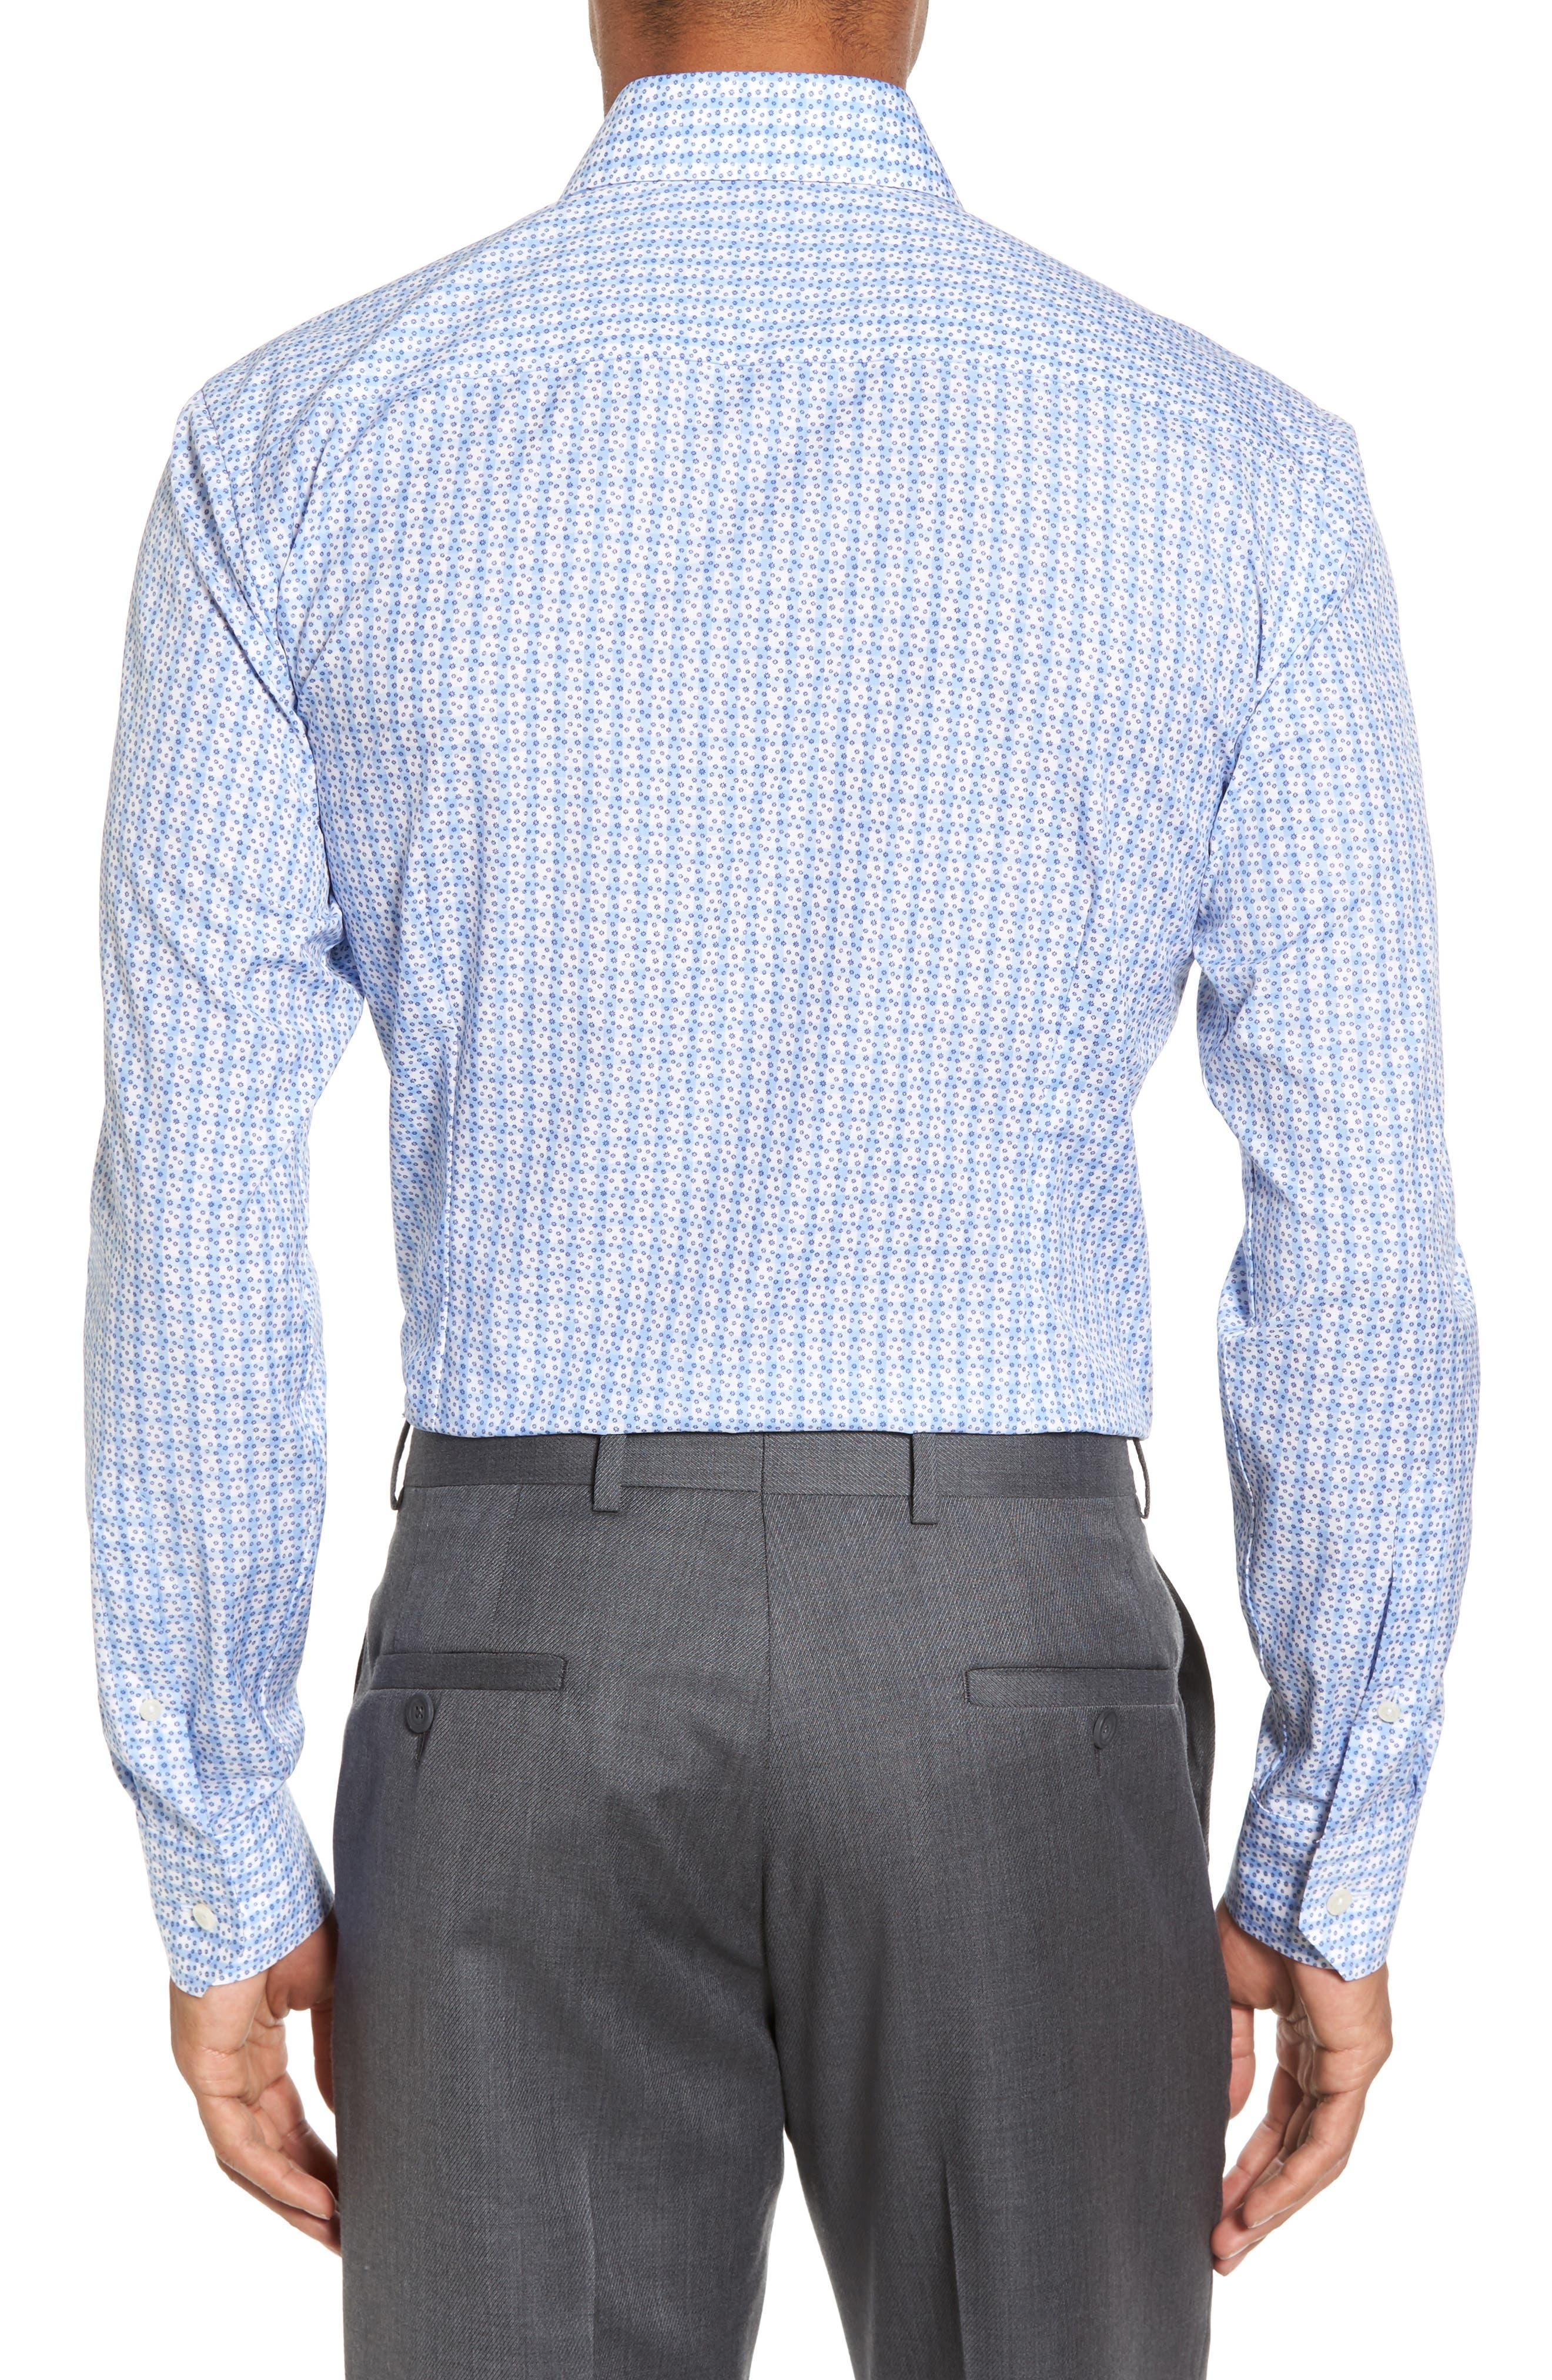 Alternate Image 3  - Eton Slim Fit Microprint Dress Shirt